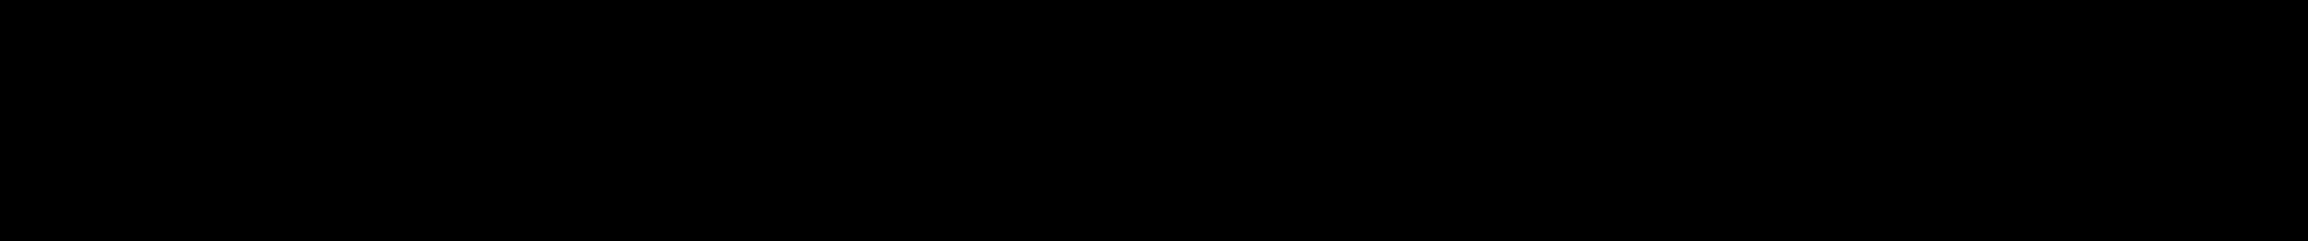 Museo Sans Cyrillic 900